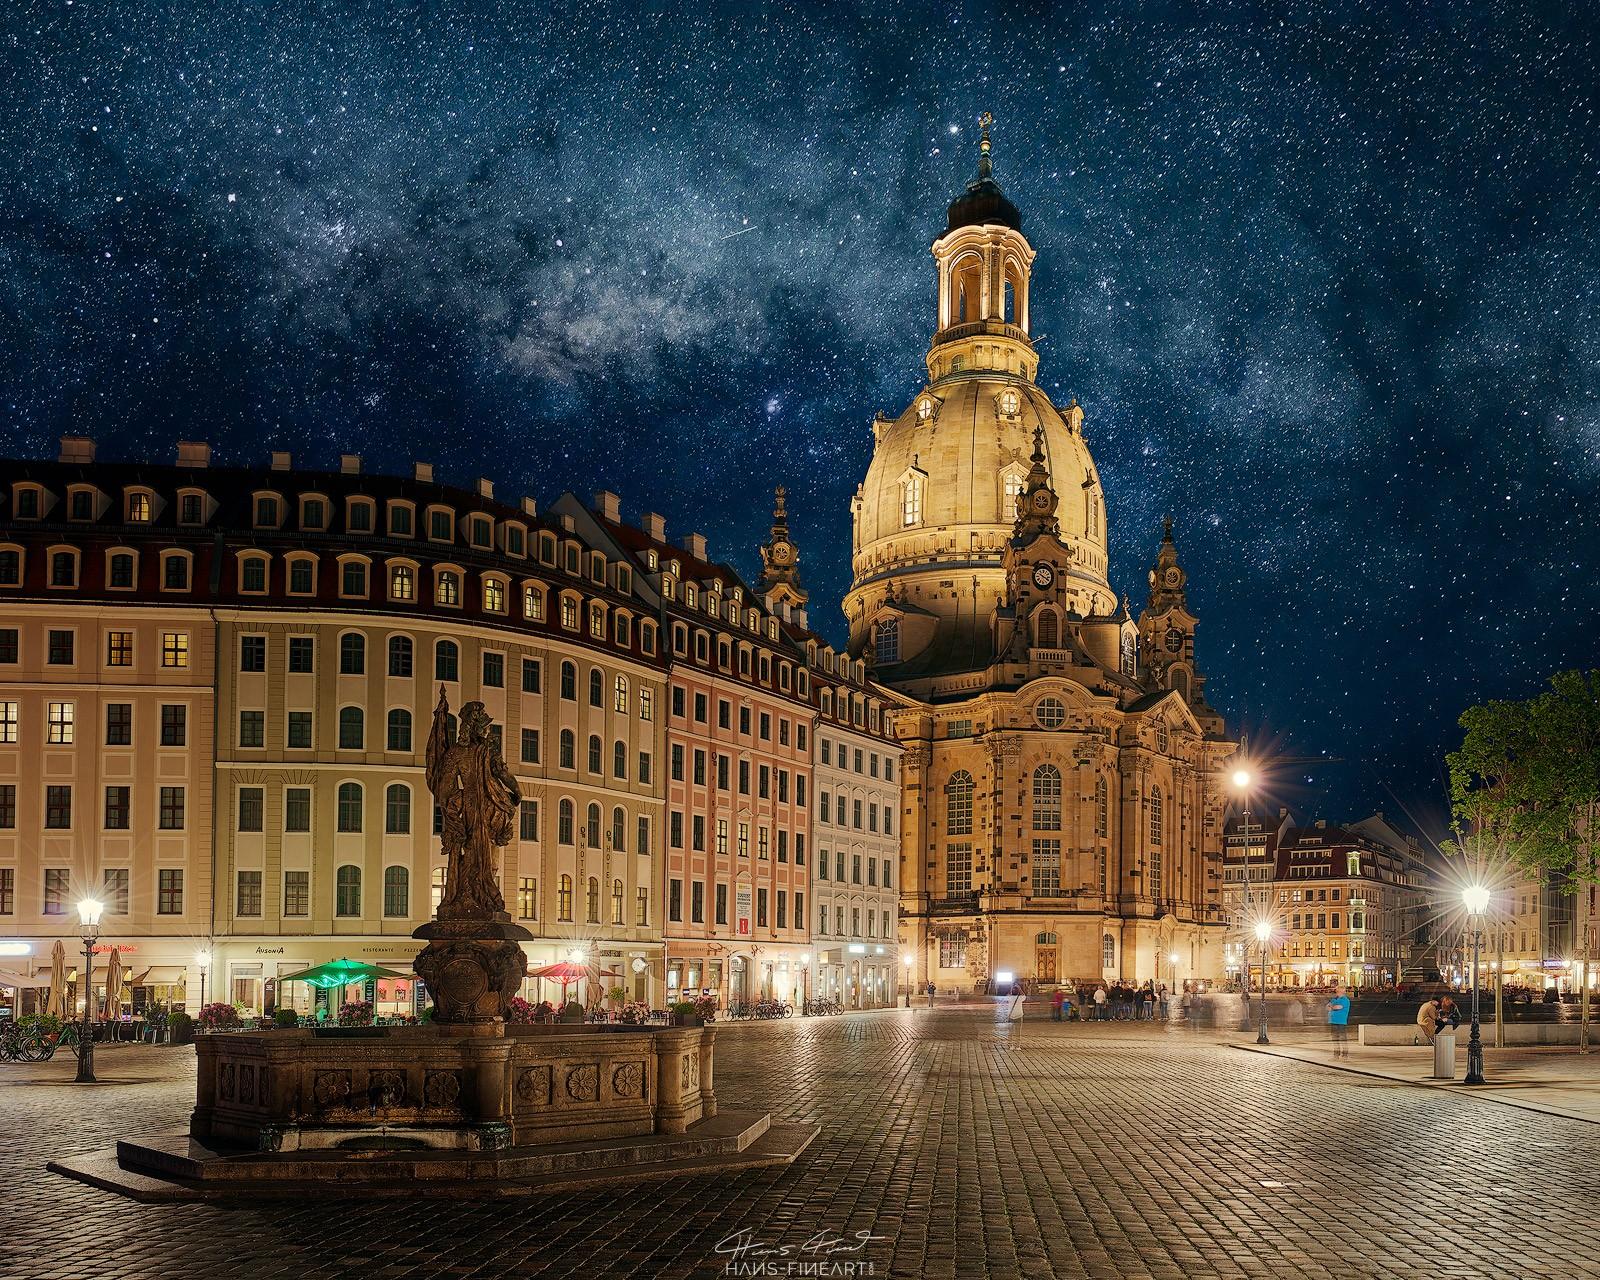 Dresdner Frauenkirche bei Nacht mit Friedensbrunnen Hans Fineart